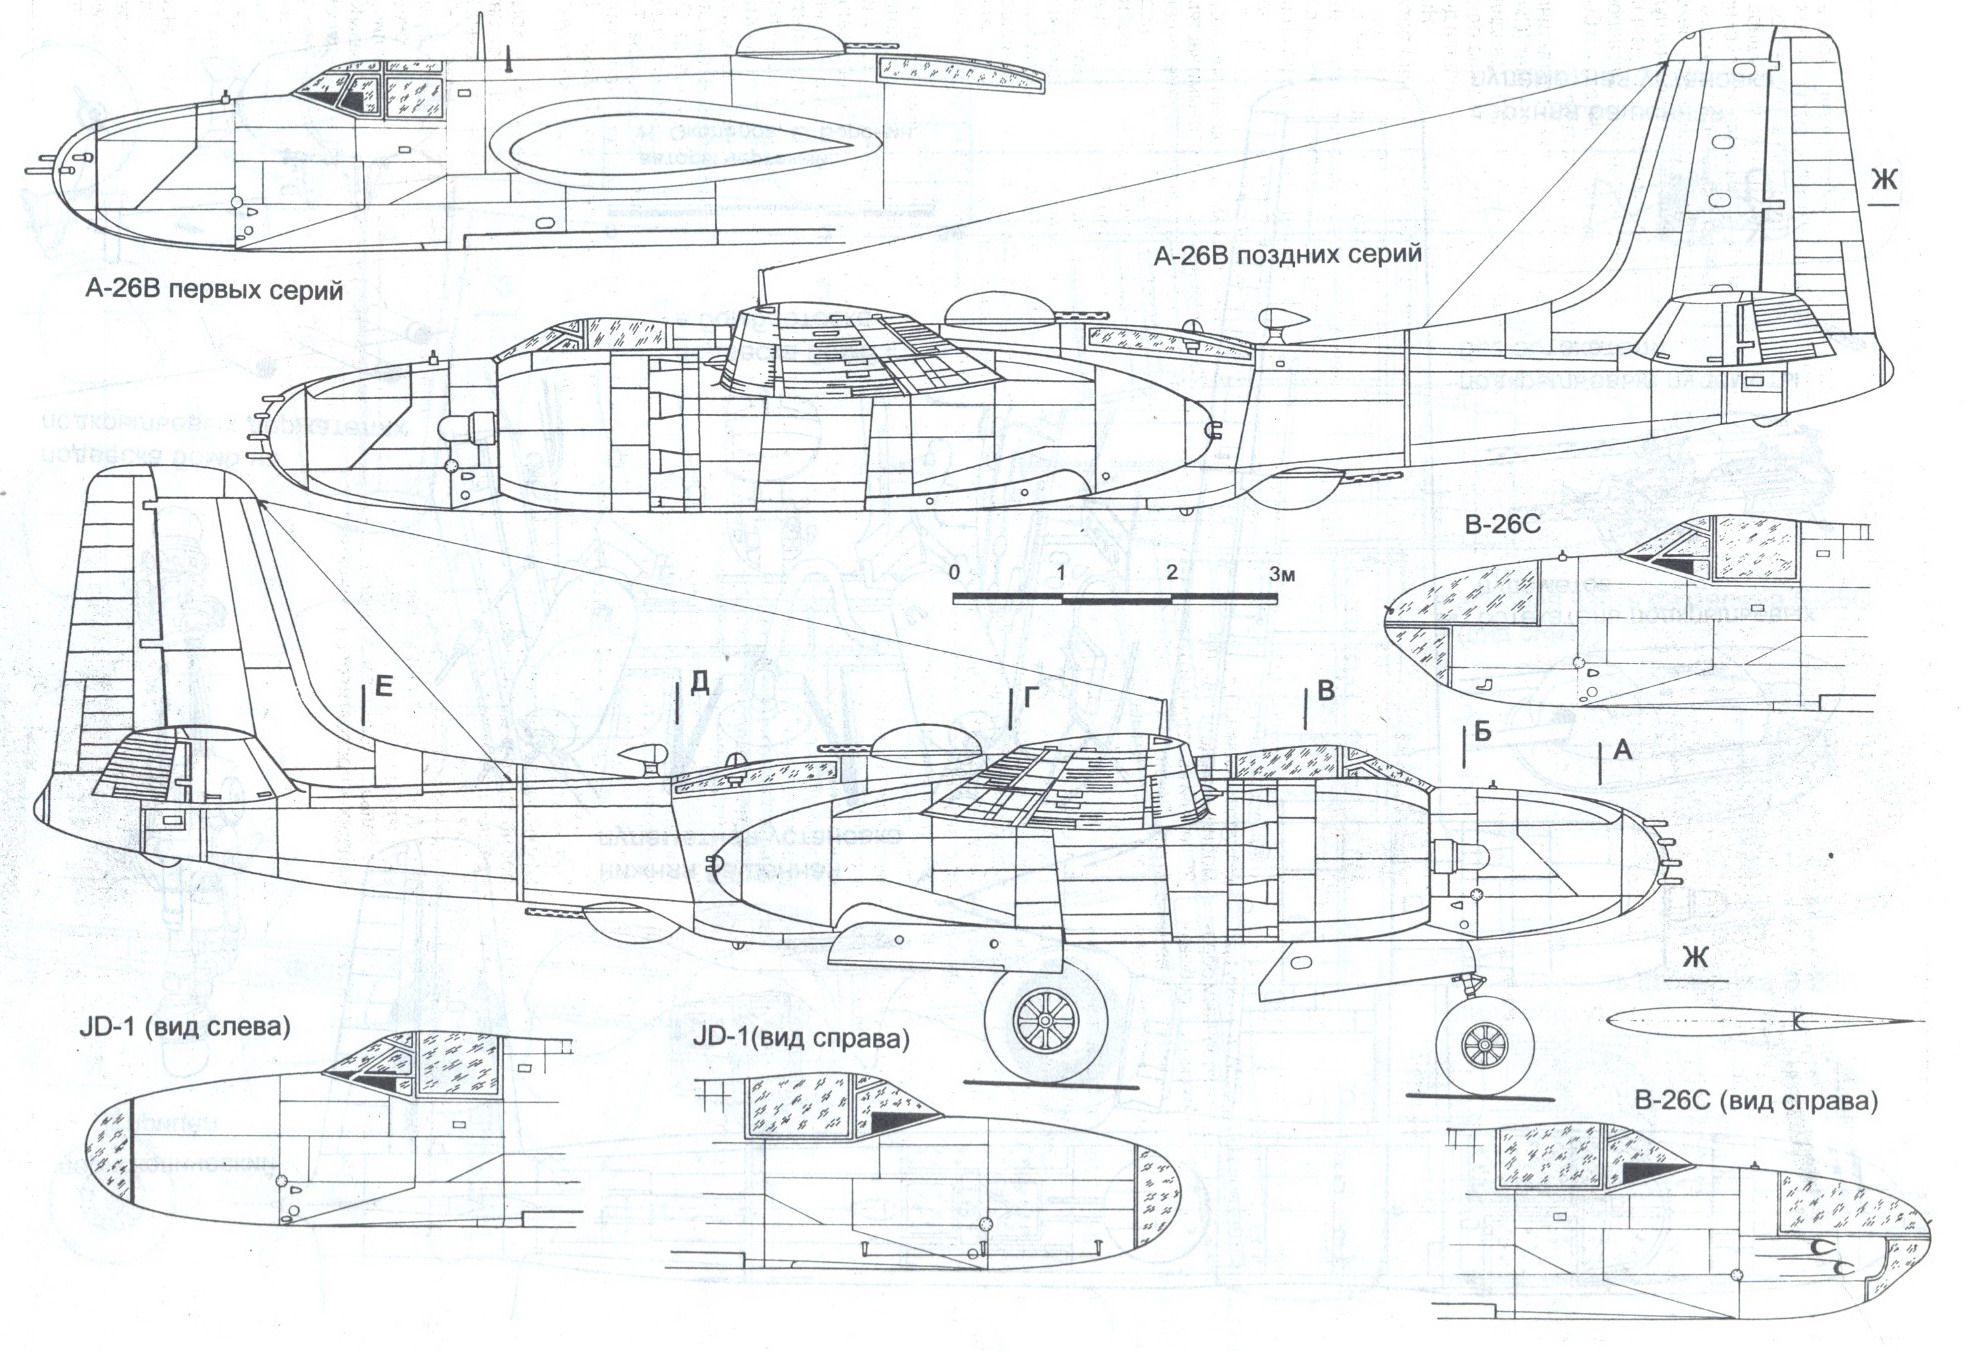 B-26 Marauder blueprint